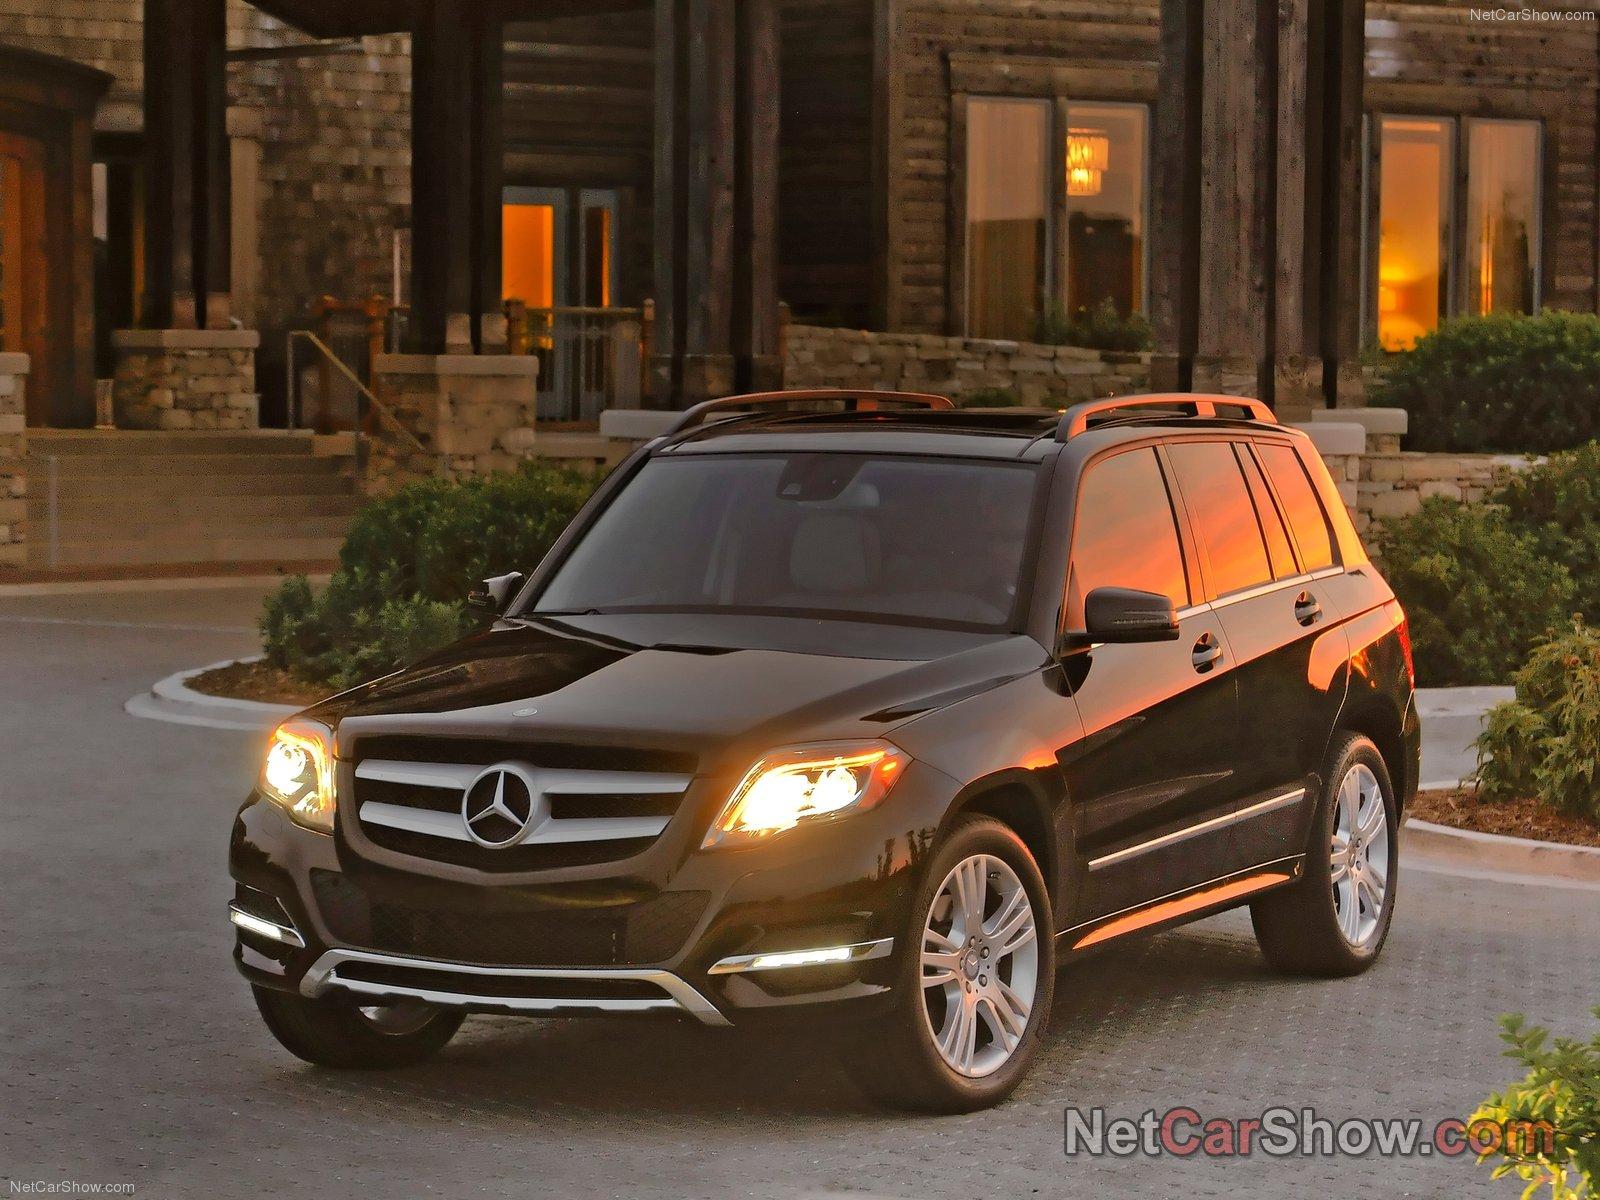 Mercedes Benz Glk Amg Picture 92900 Mercedes Benz Photo Gallery